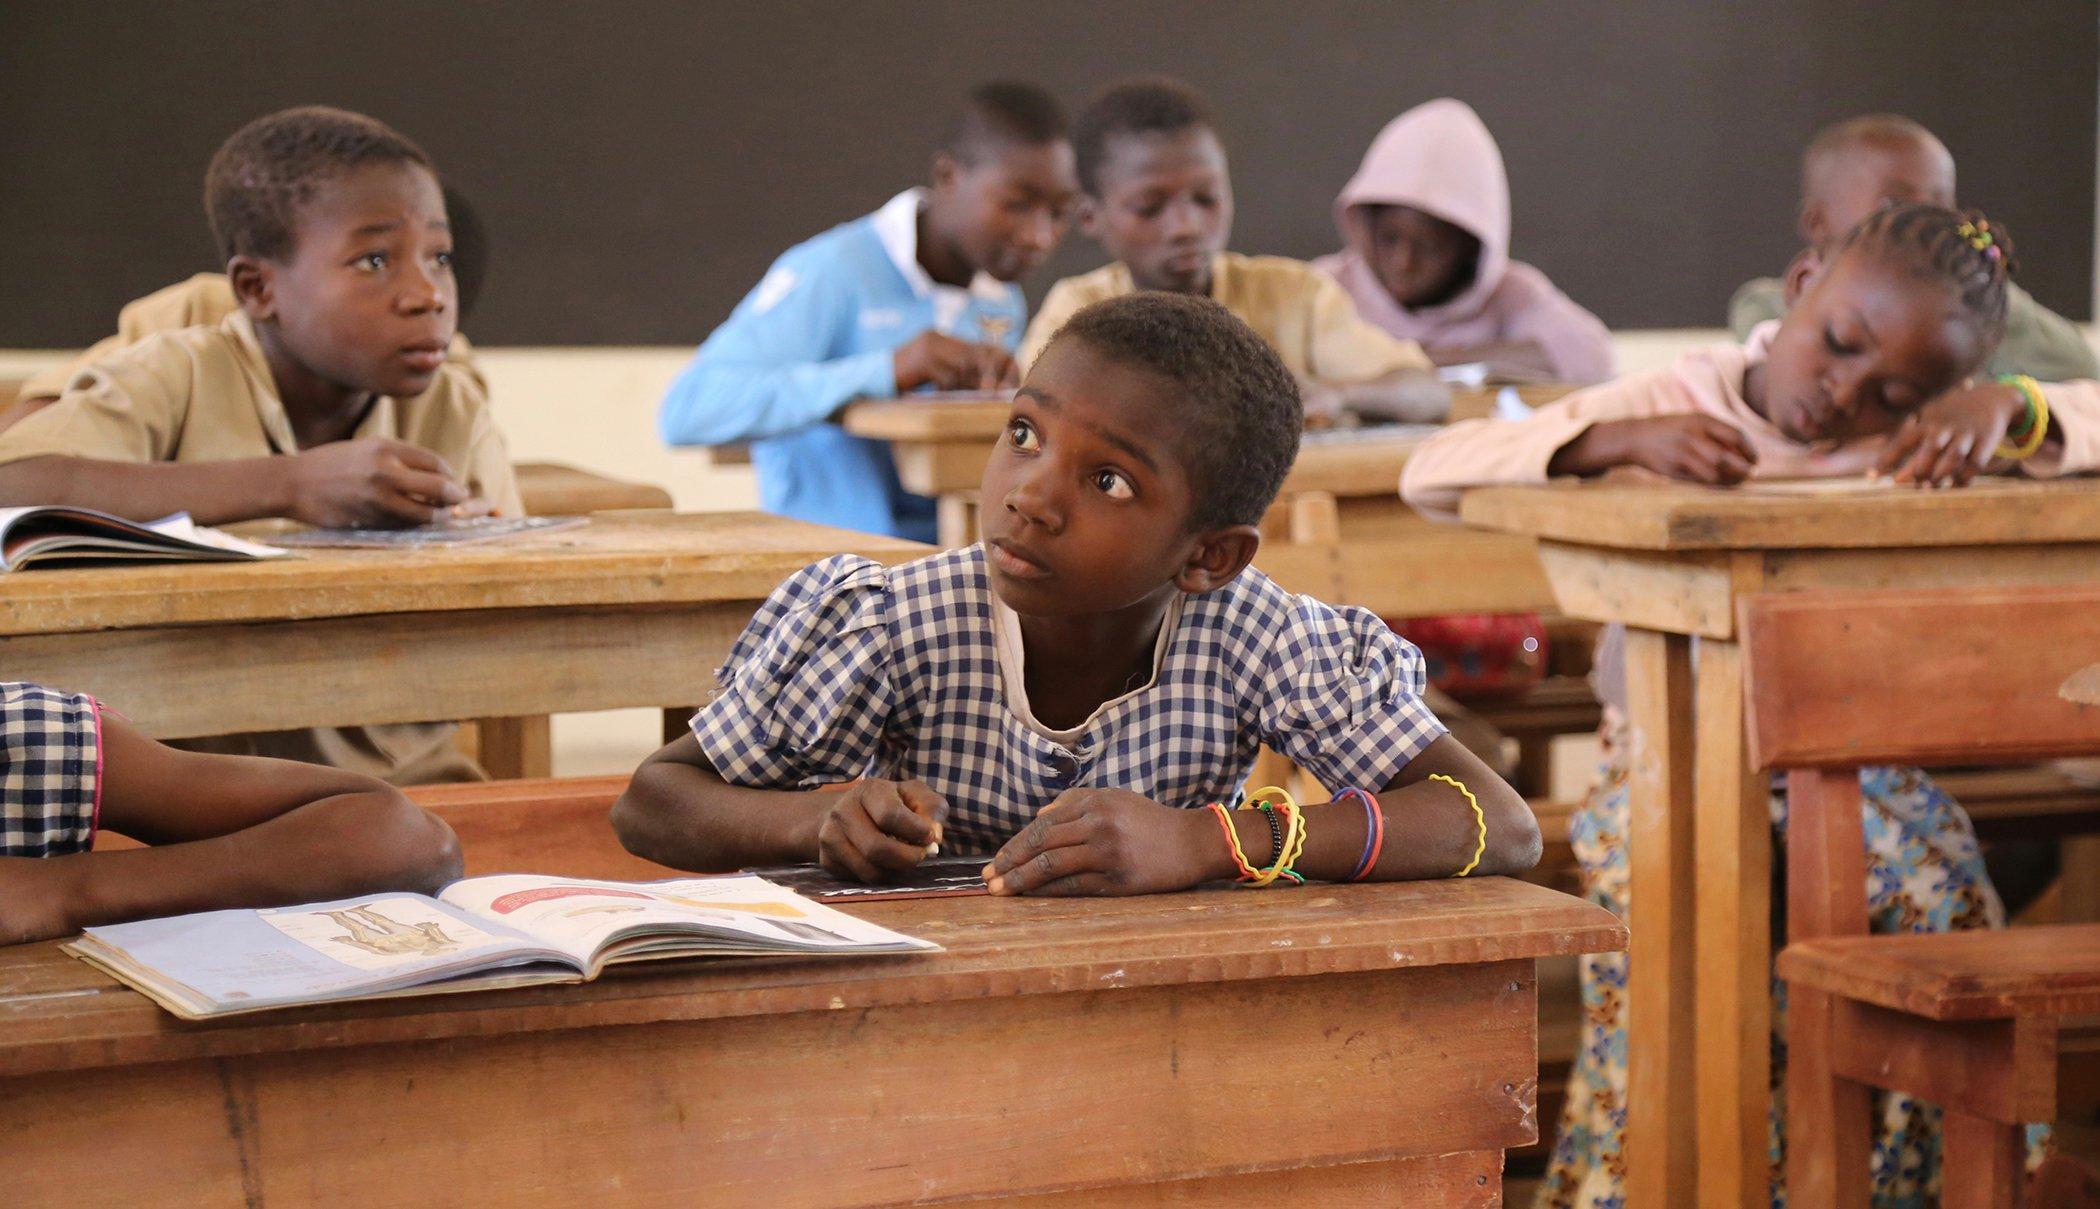 EducationAroundTheWorld_Côte d'Ivoire_012.jpg